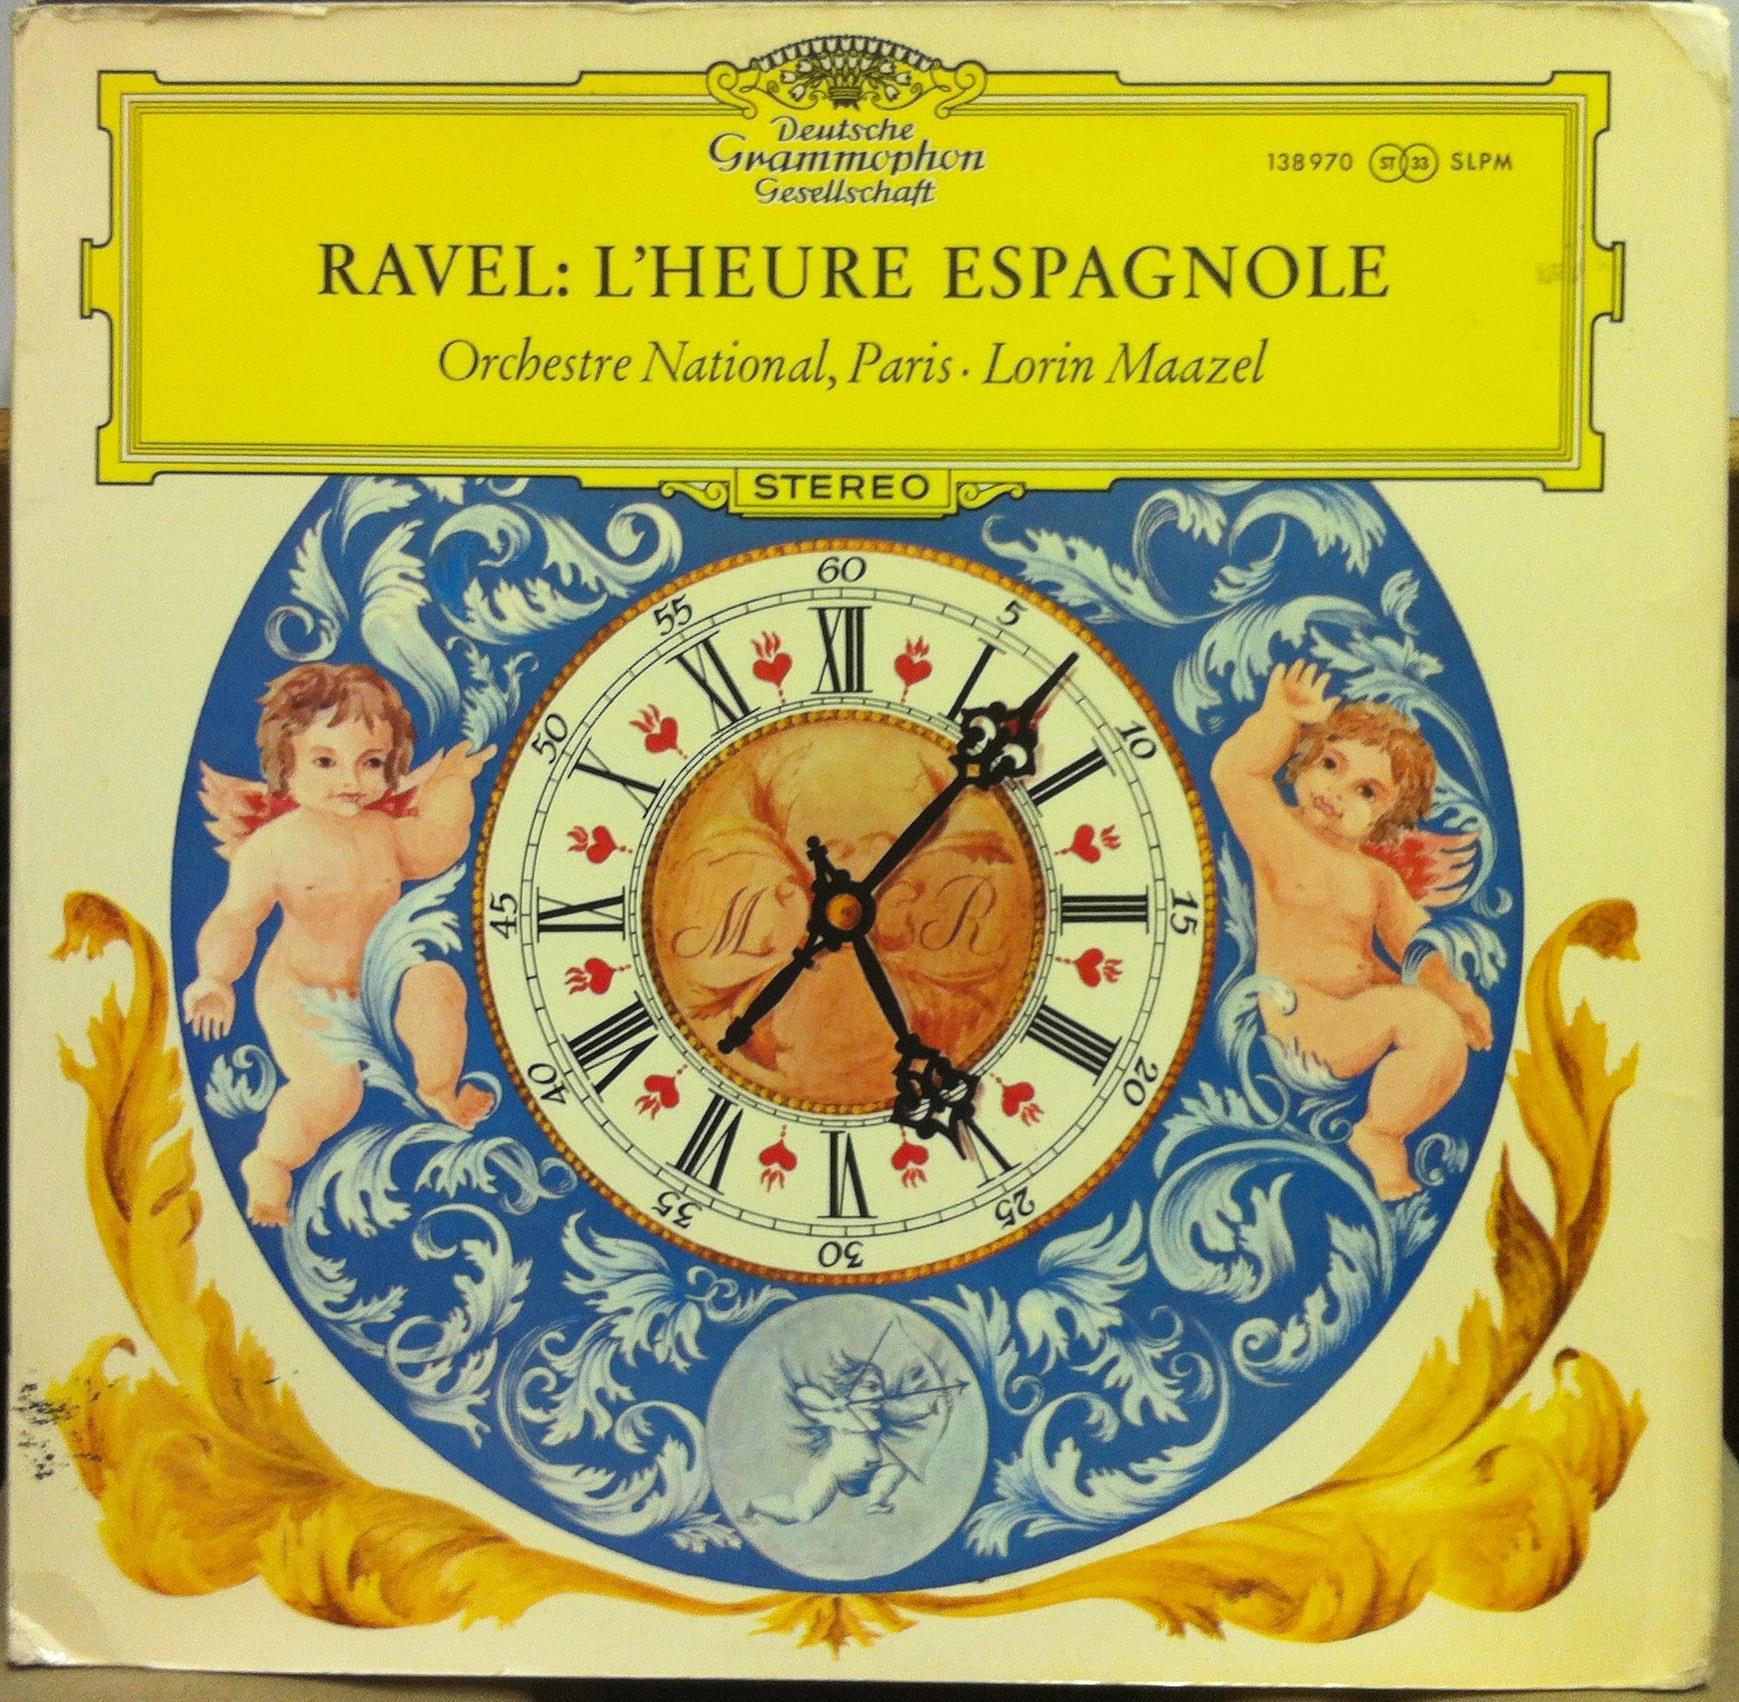 LORIN MAAZEL - Ravel L'heure Espagnole